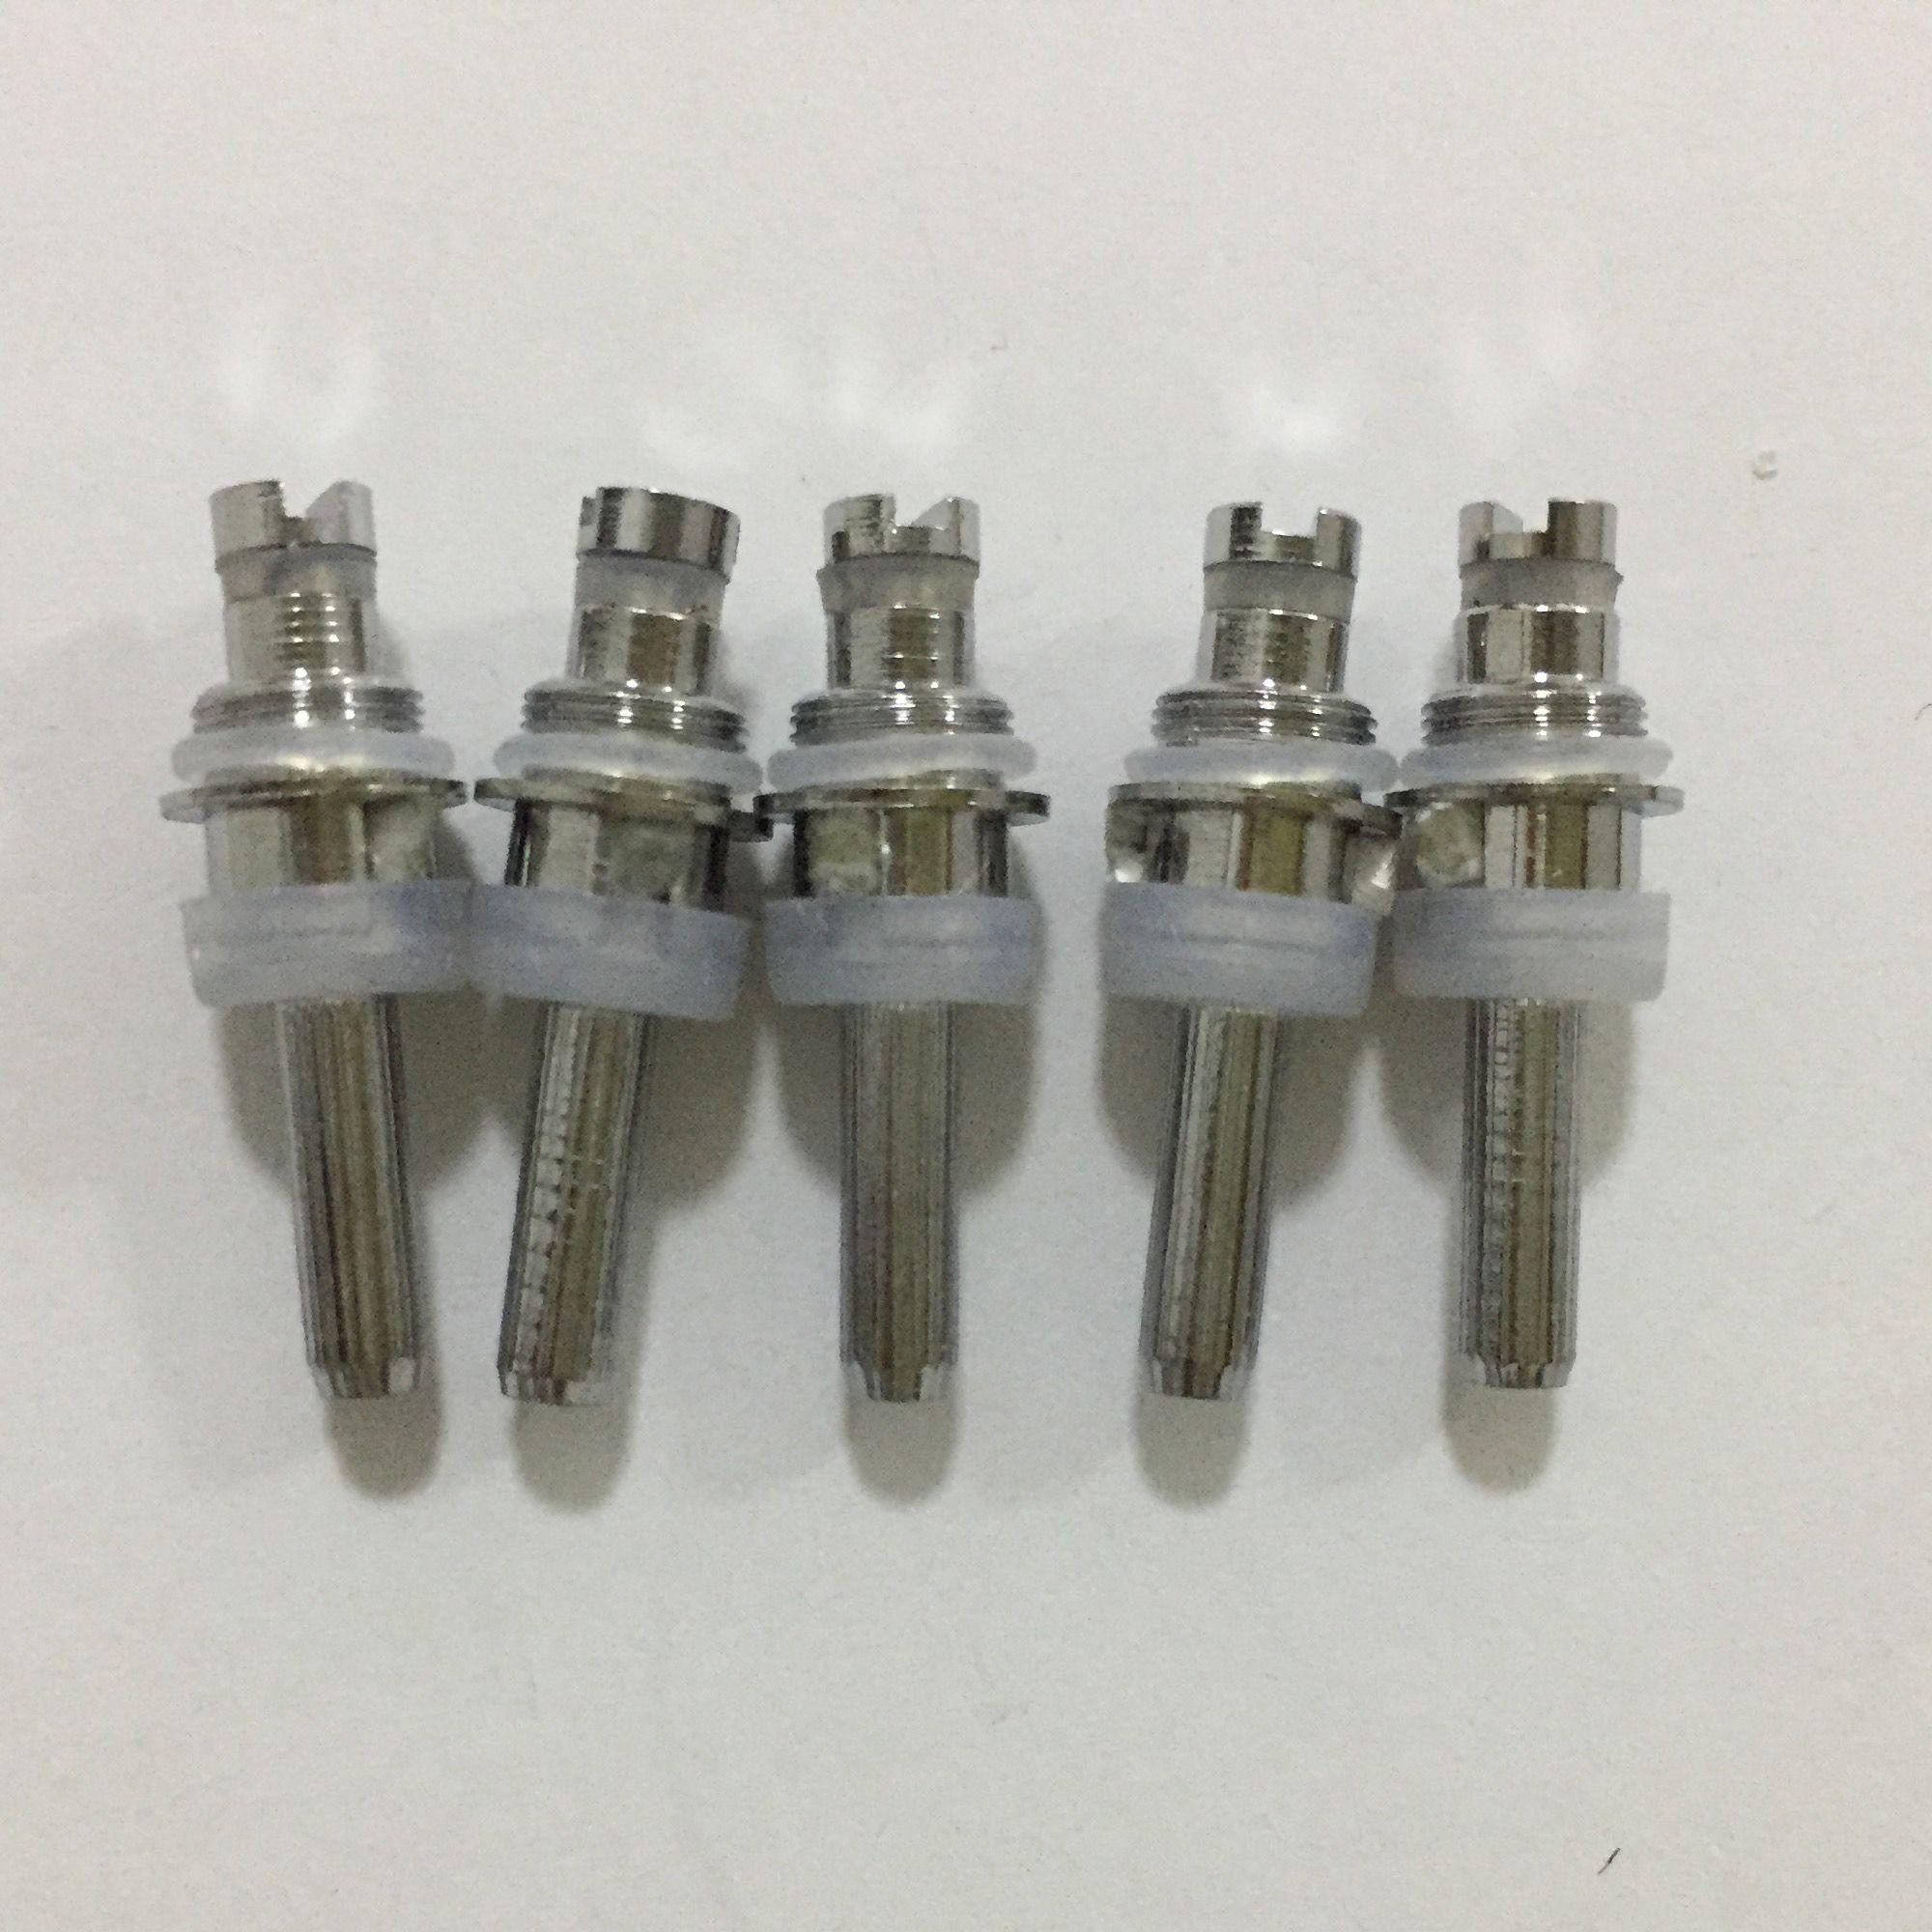 Atomizer Replacable Coil for MT3 H2 T3S T4 Protan 1 2 mini Protank Cartomizer Clearomizer Replacement Detachable Core Head bestvaporseller